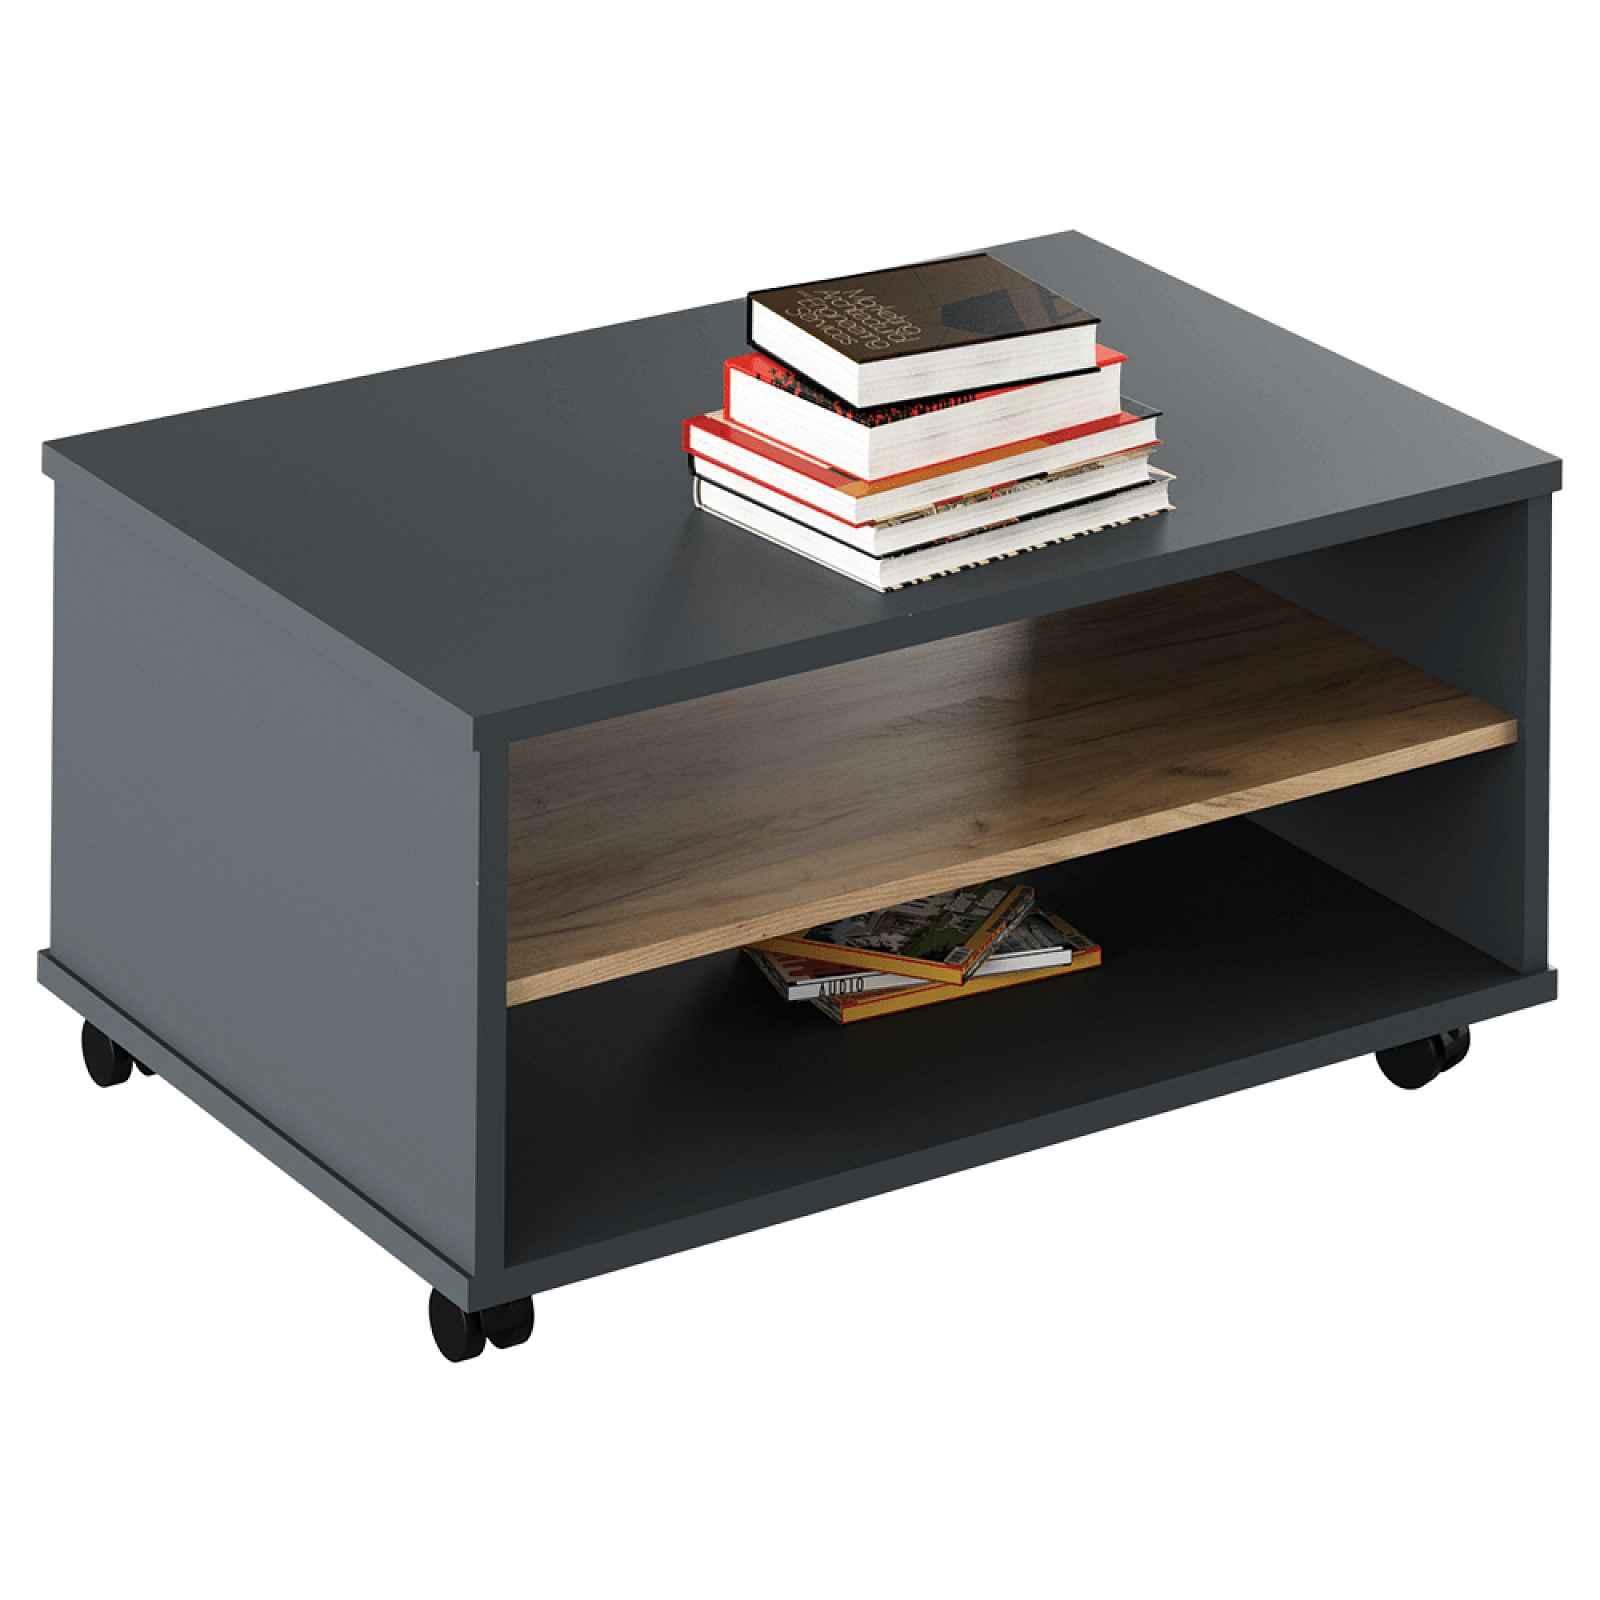 Konferenční stolek RIOMA TYP 32 Tempo Kondela Grafit / dub artisan